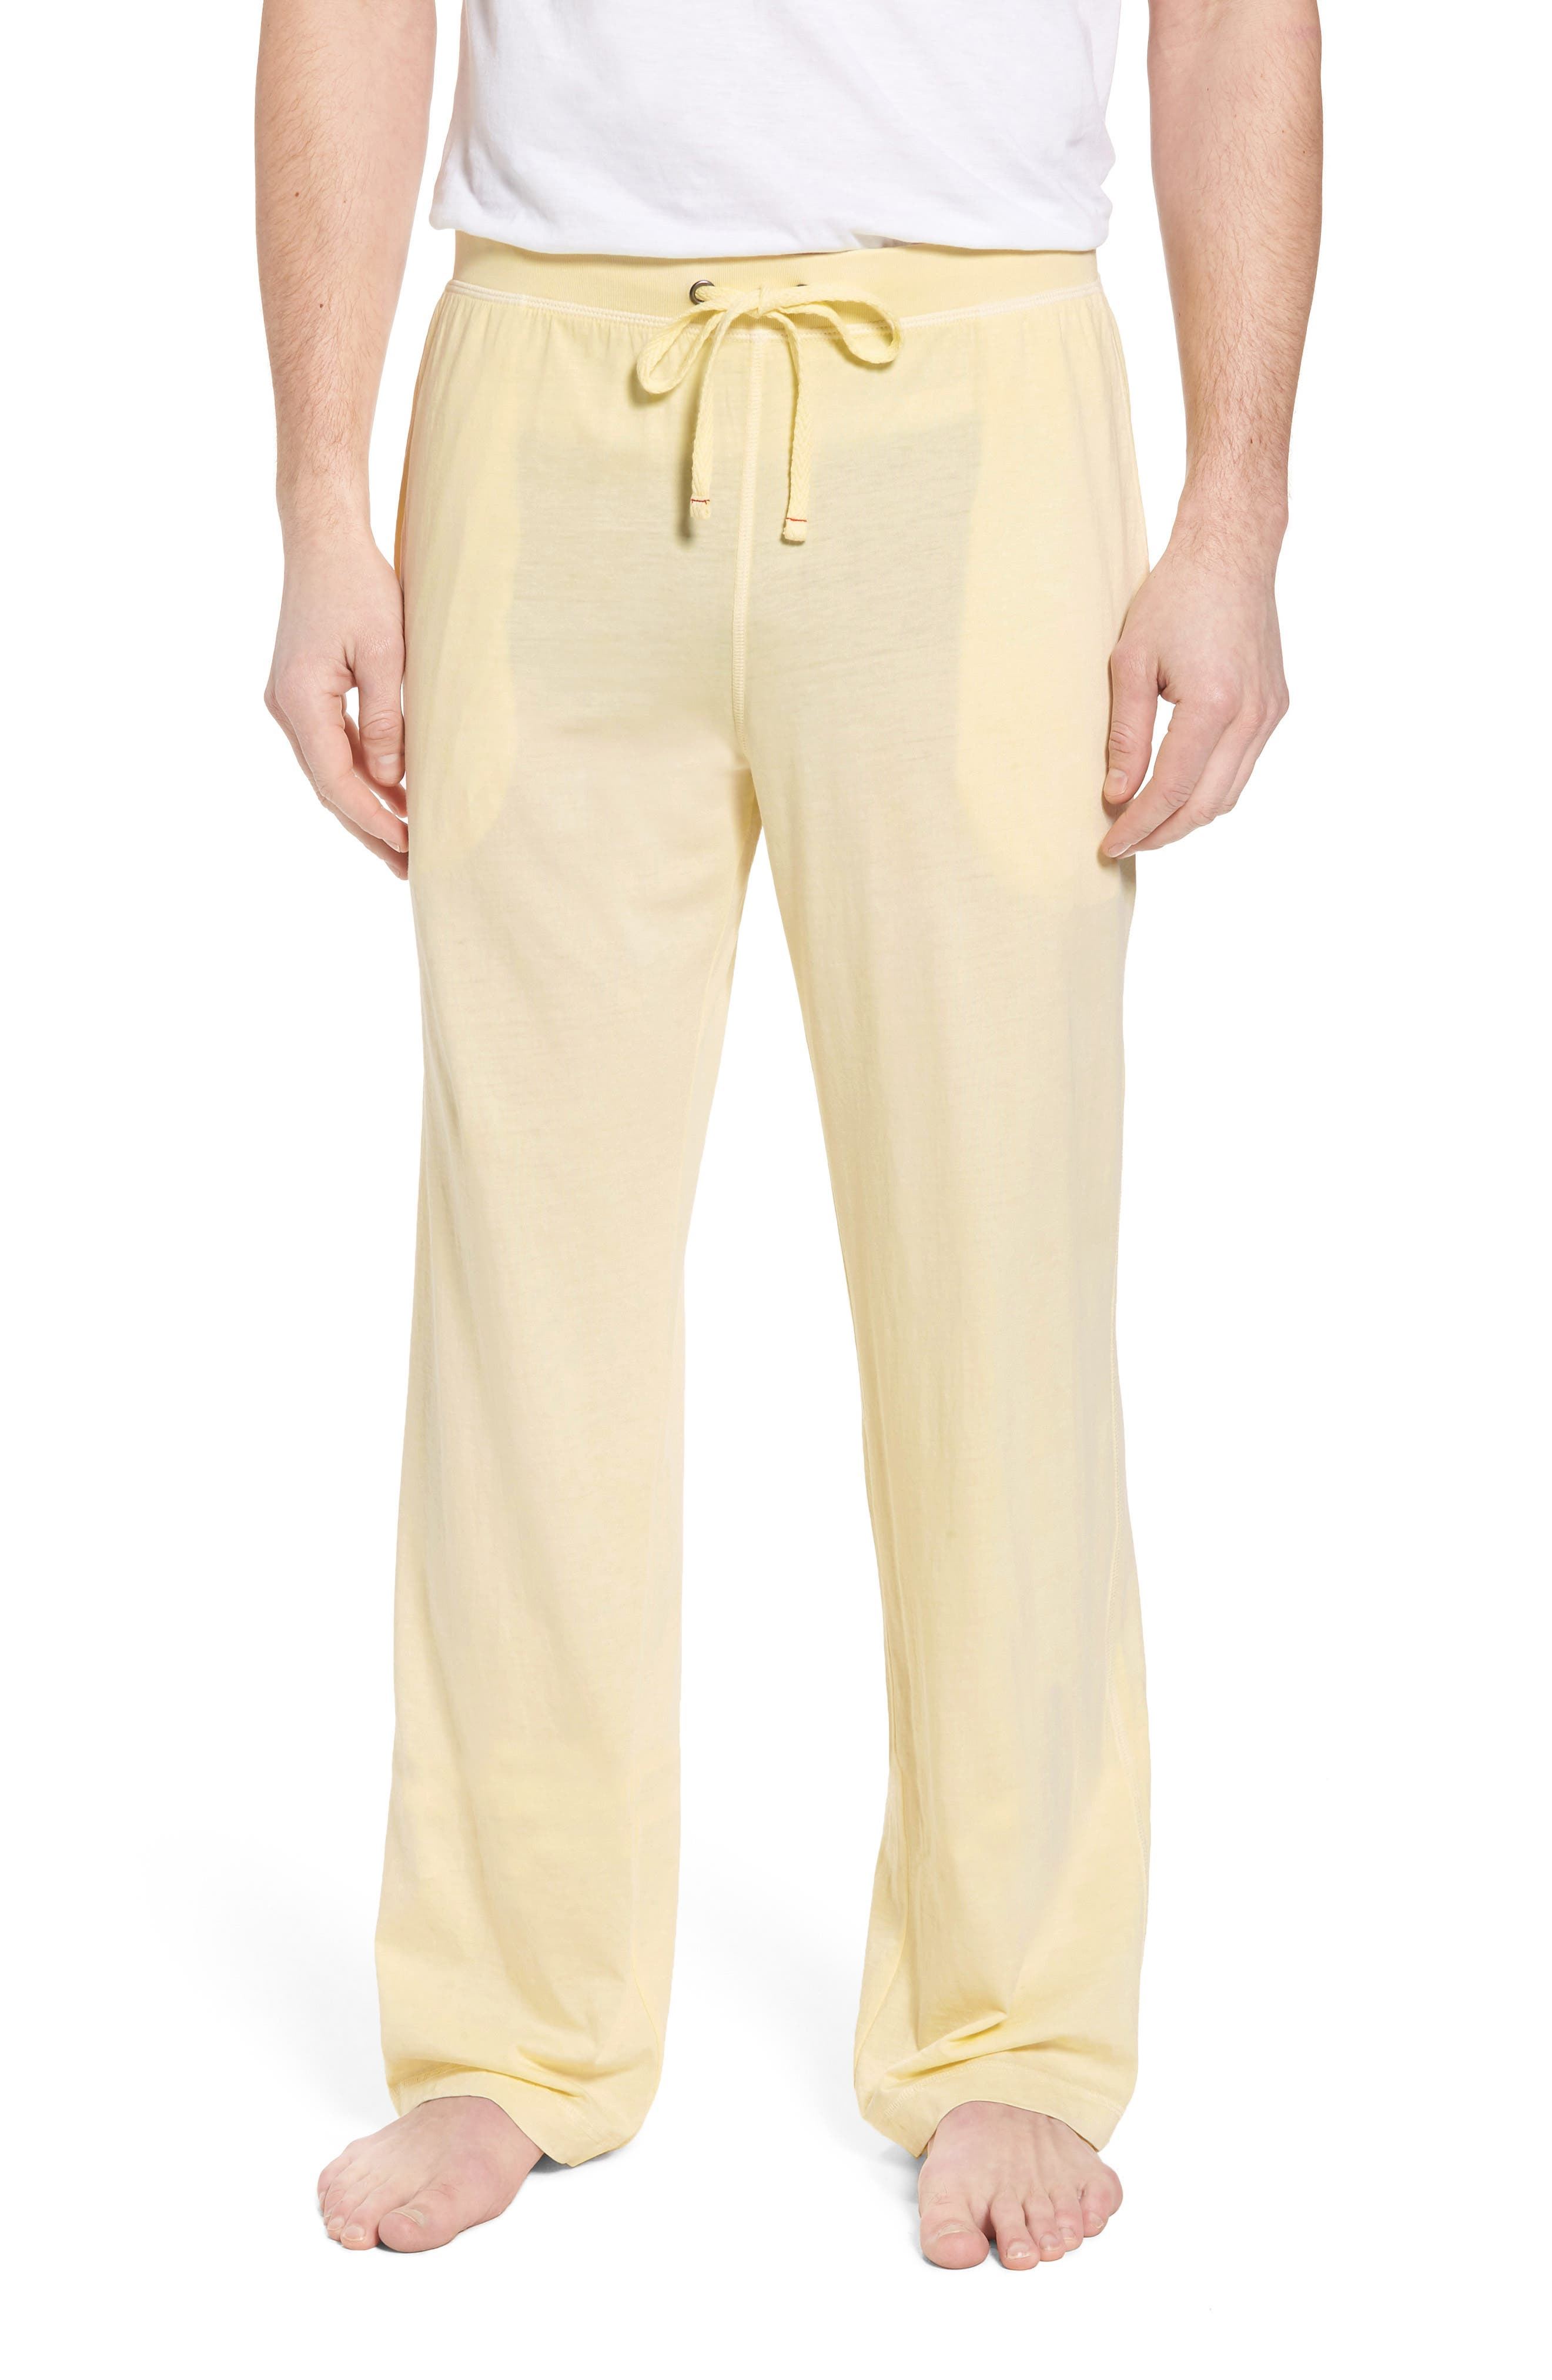 Peruvian Pima Cotton Lounge Pants,                         Main,                         color, YELLOW